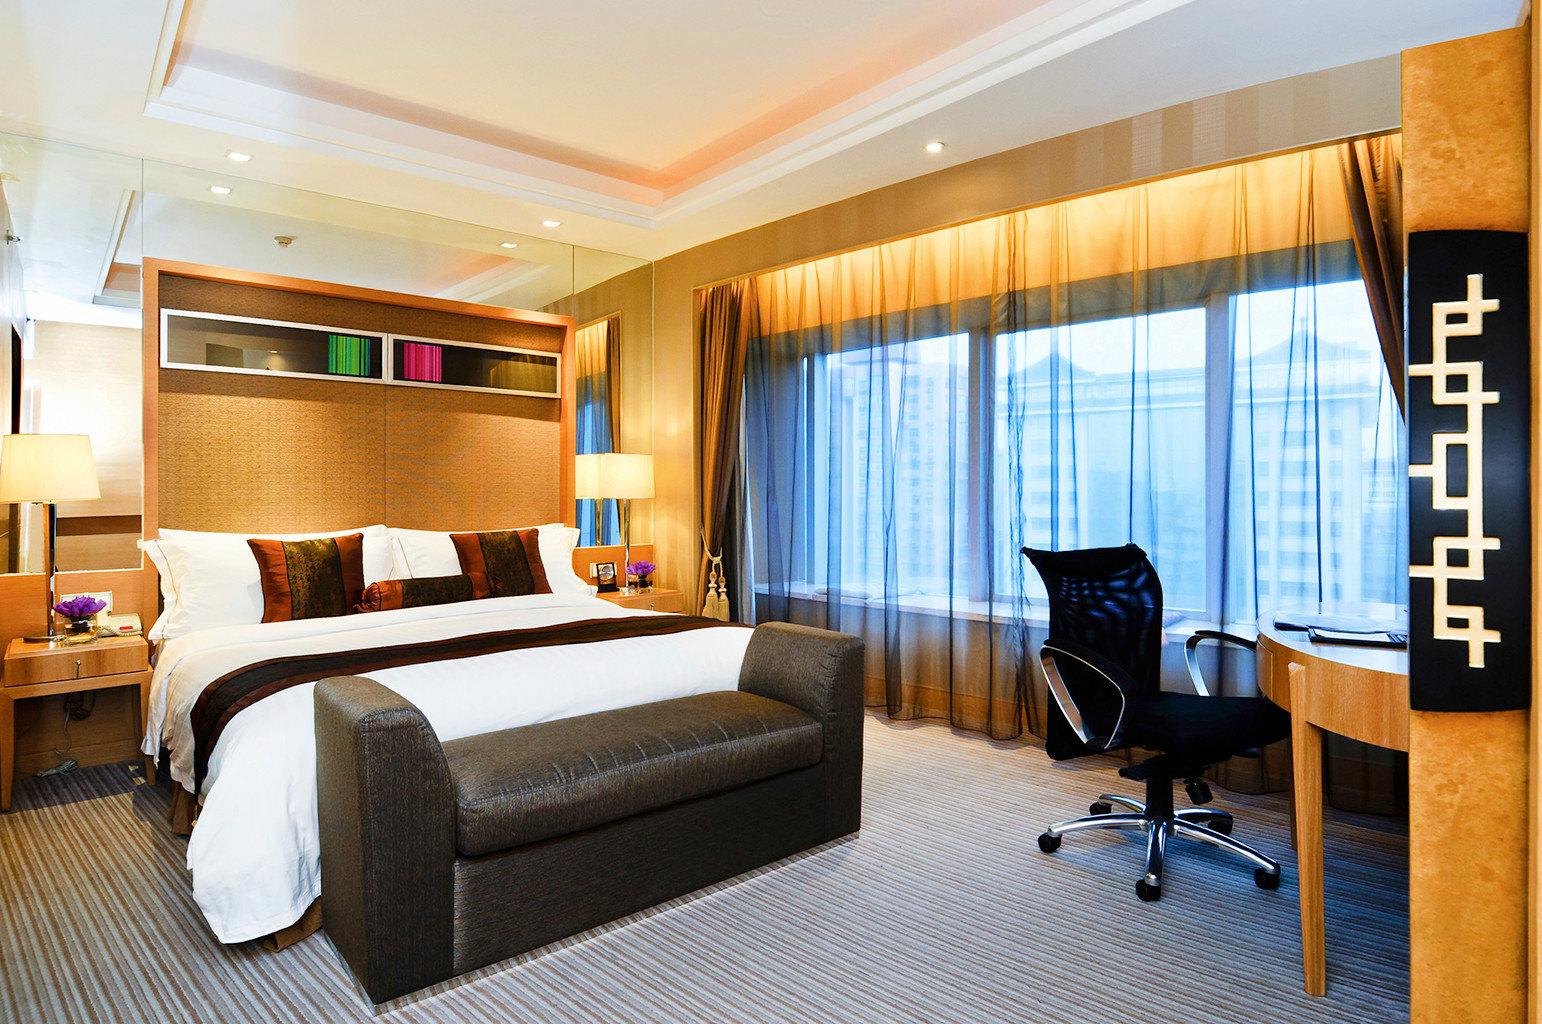 Bedroom Classic Resort chair property Suite yacht condominium vehicle living room